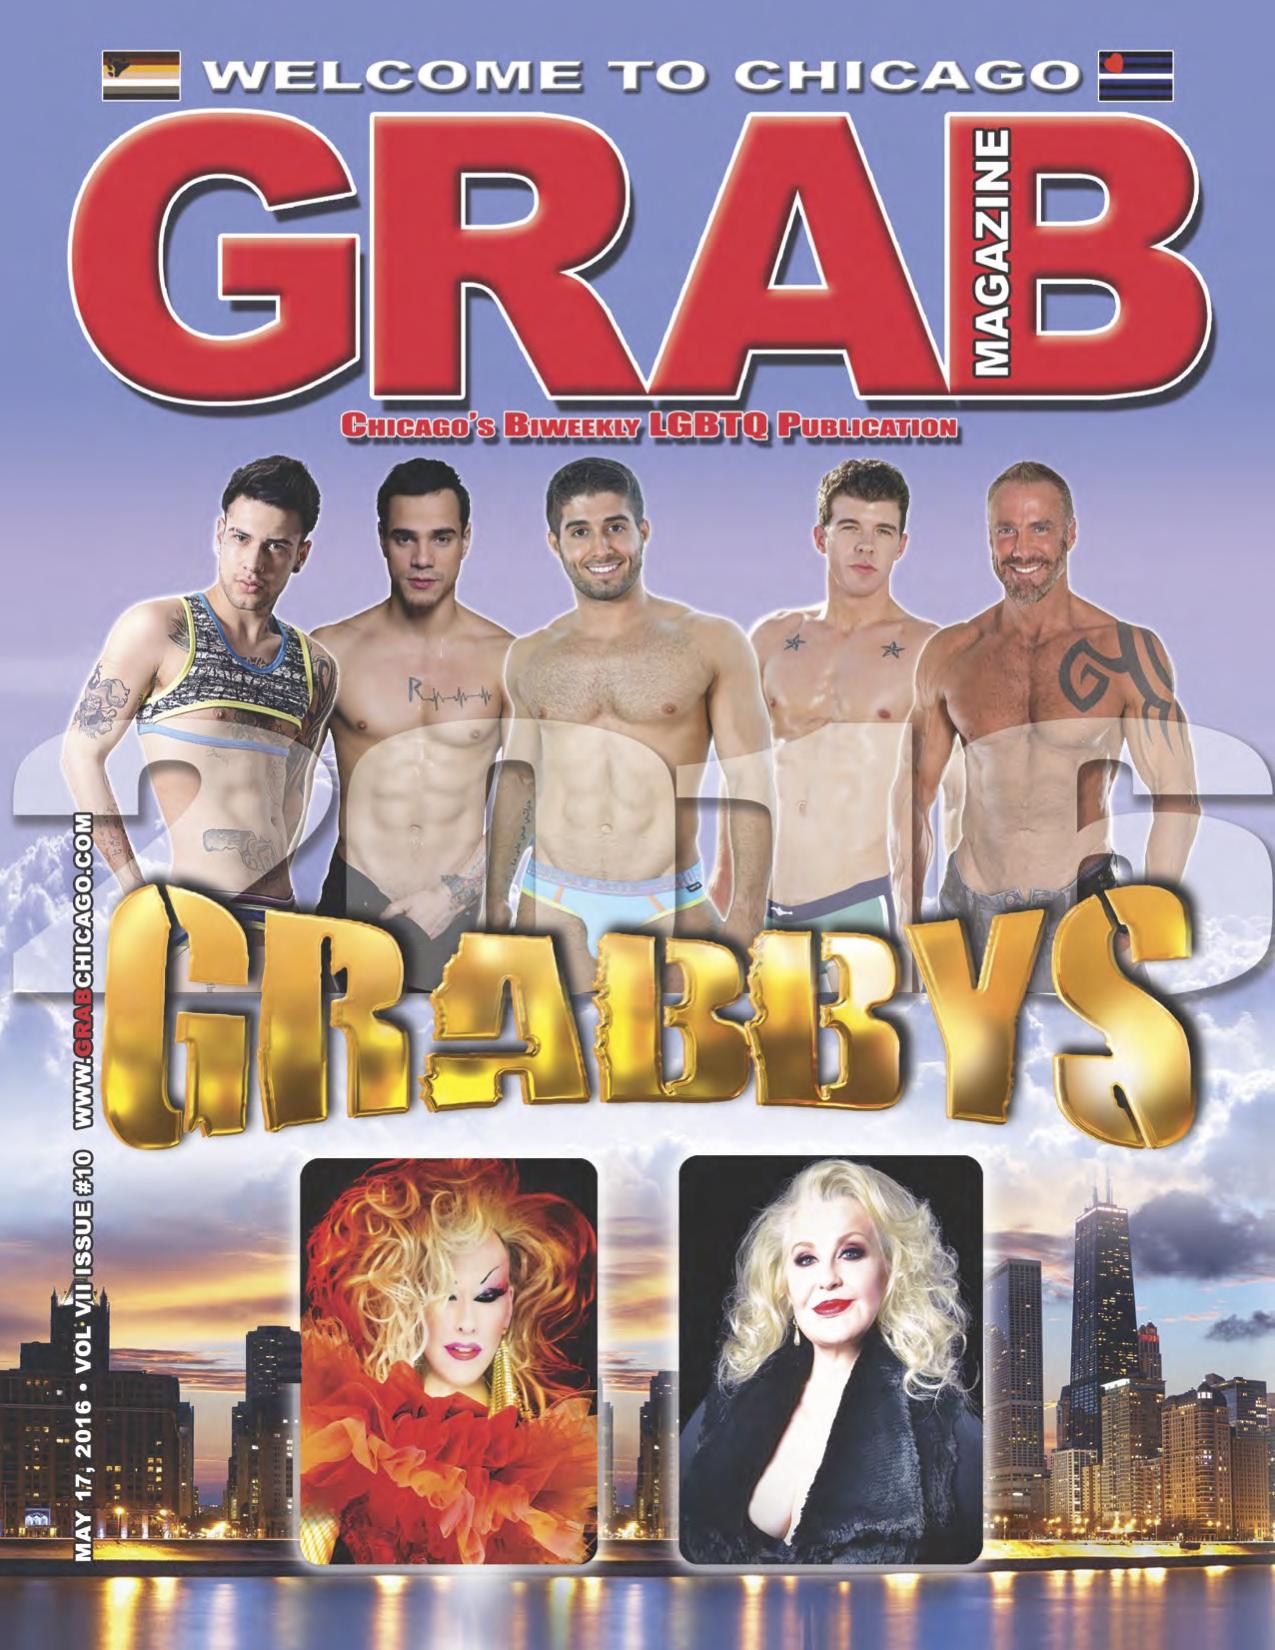 May 17, 2016 - Grab Magazine - cover